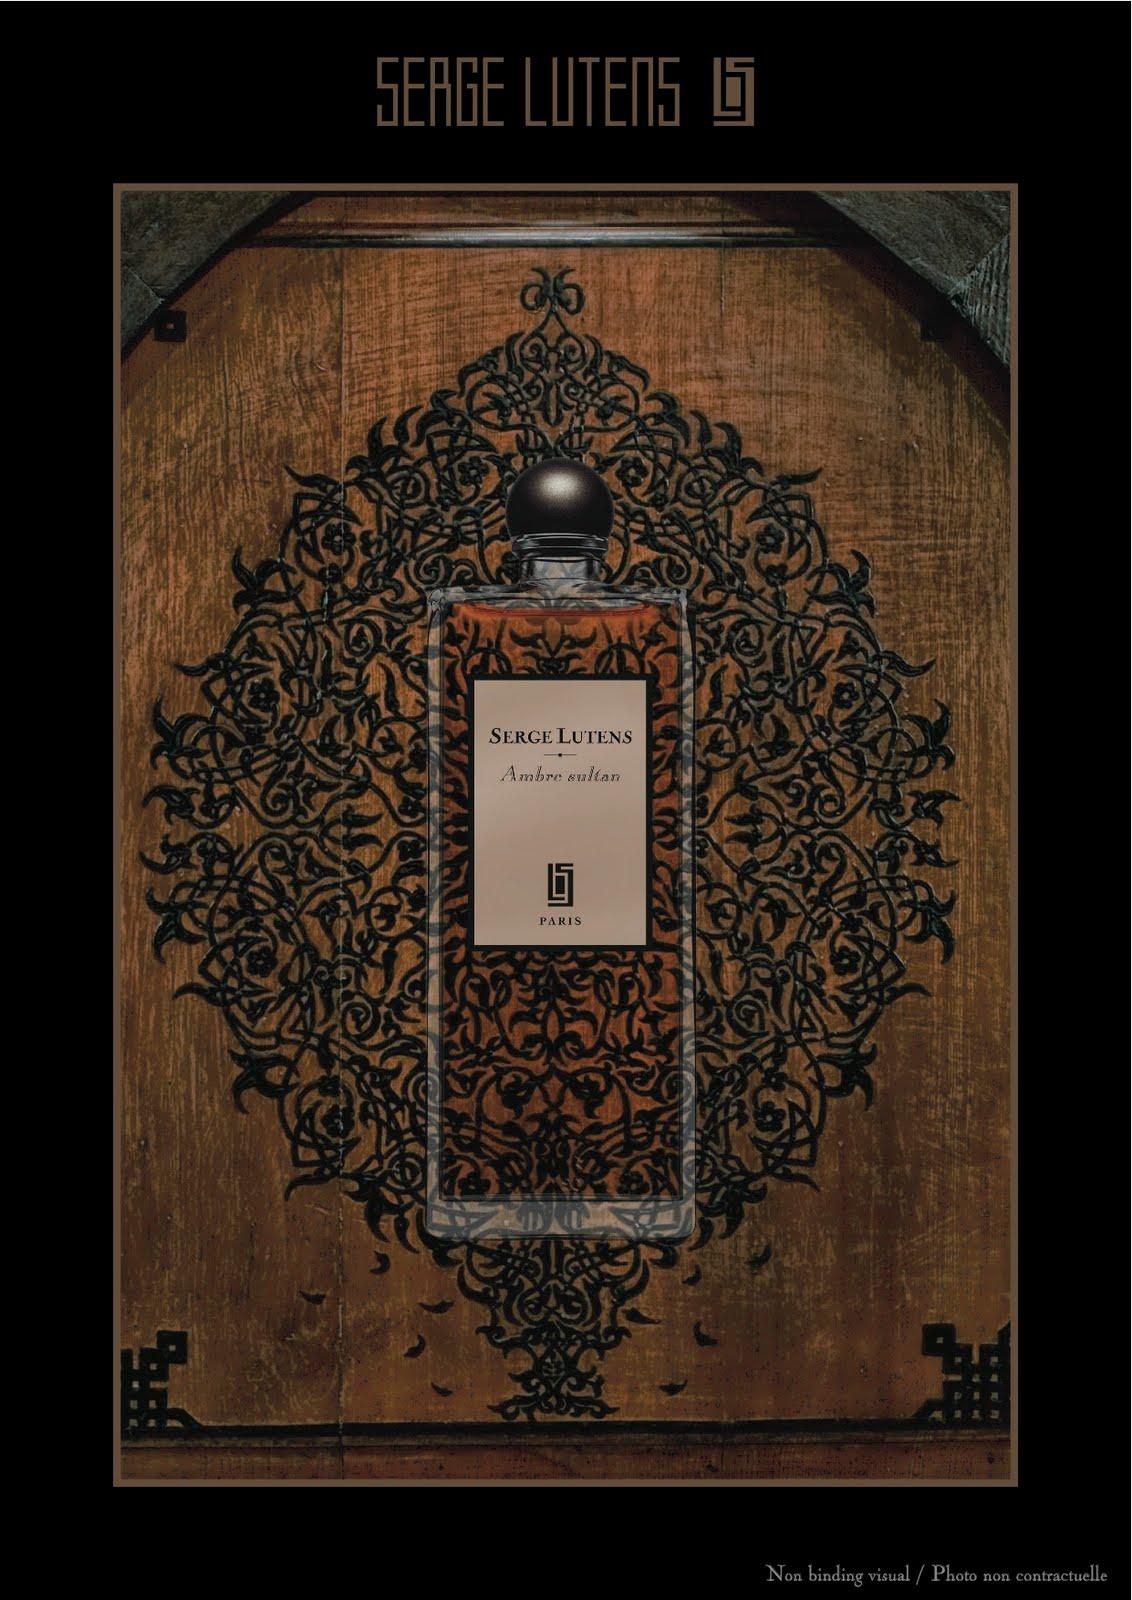 perfume shrine serge lutens ambre sultan fragrance review. Black Bedroom Furniture Sets. Home Design Ideas